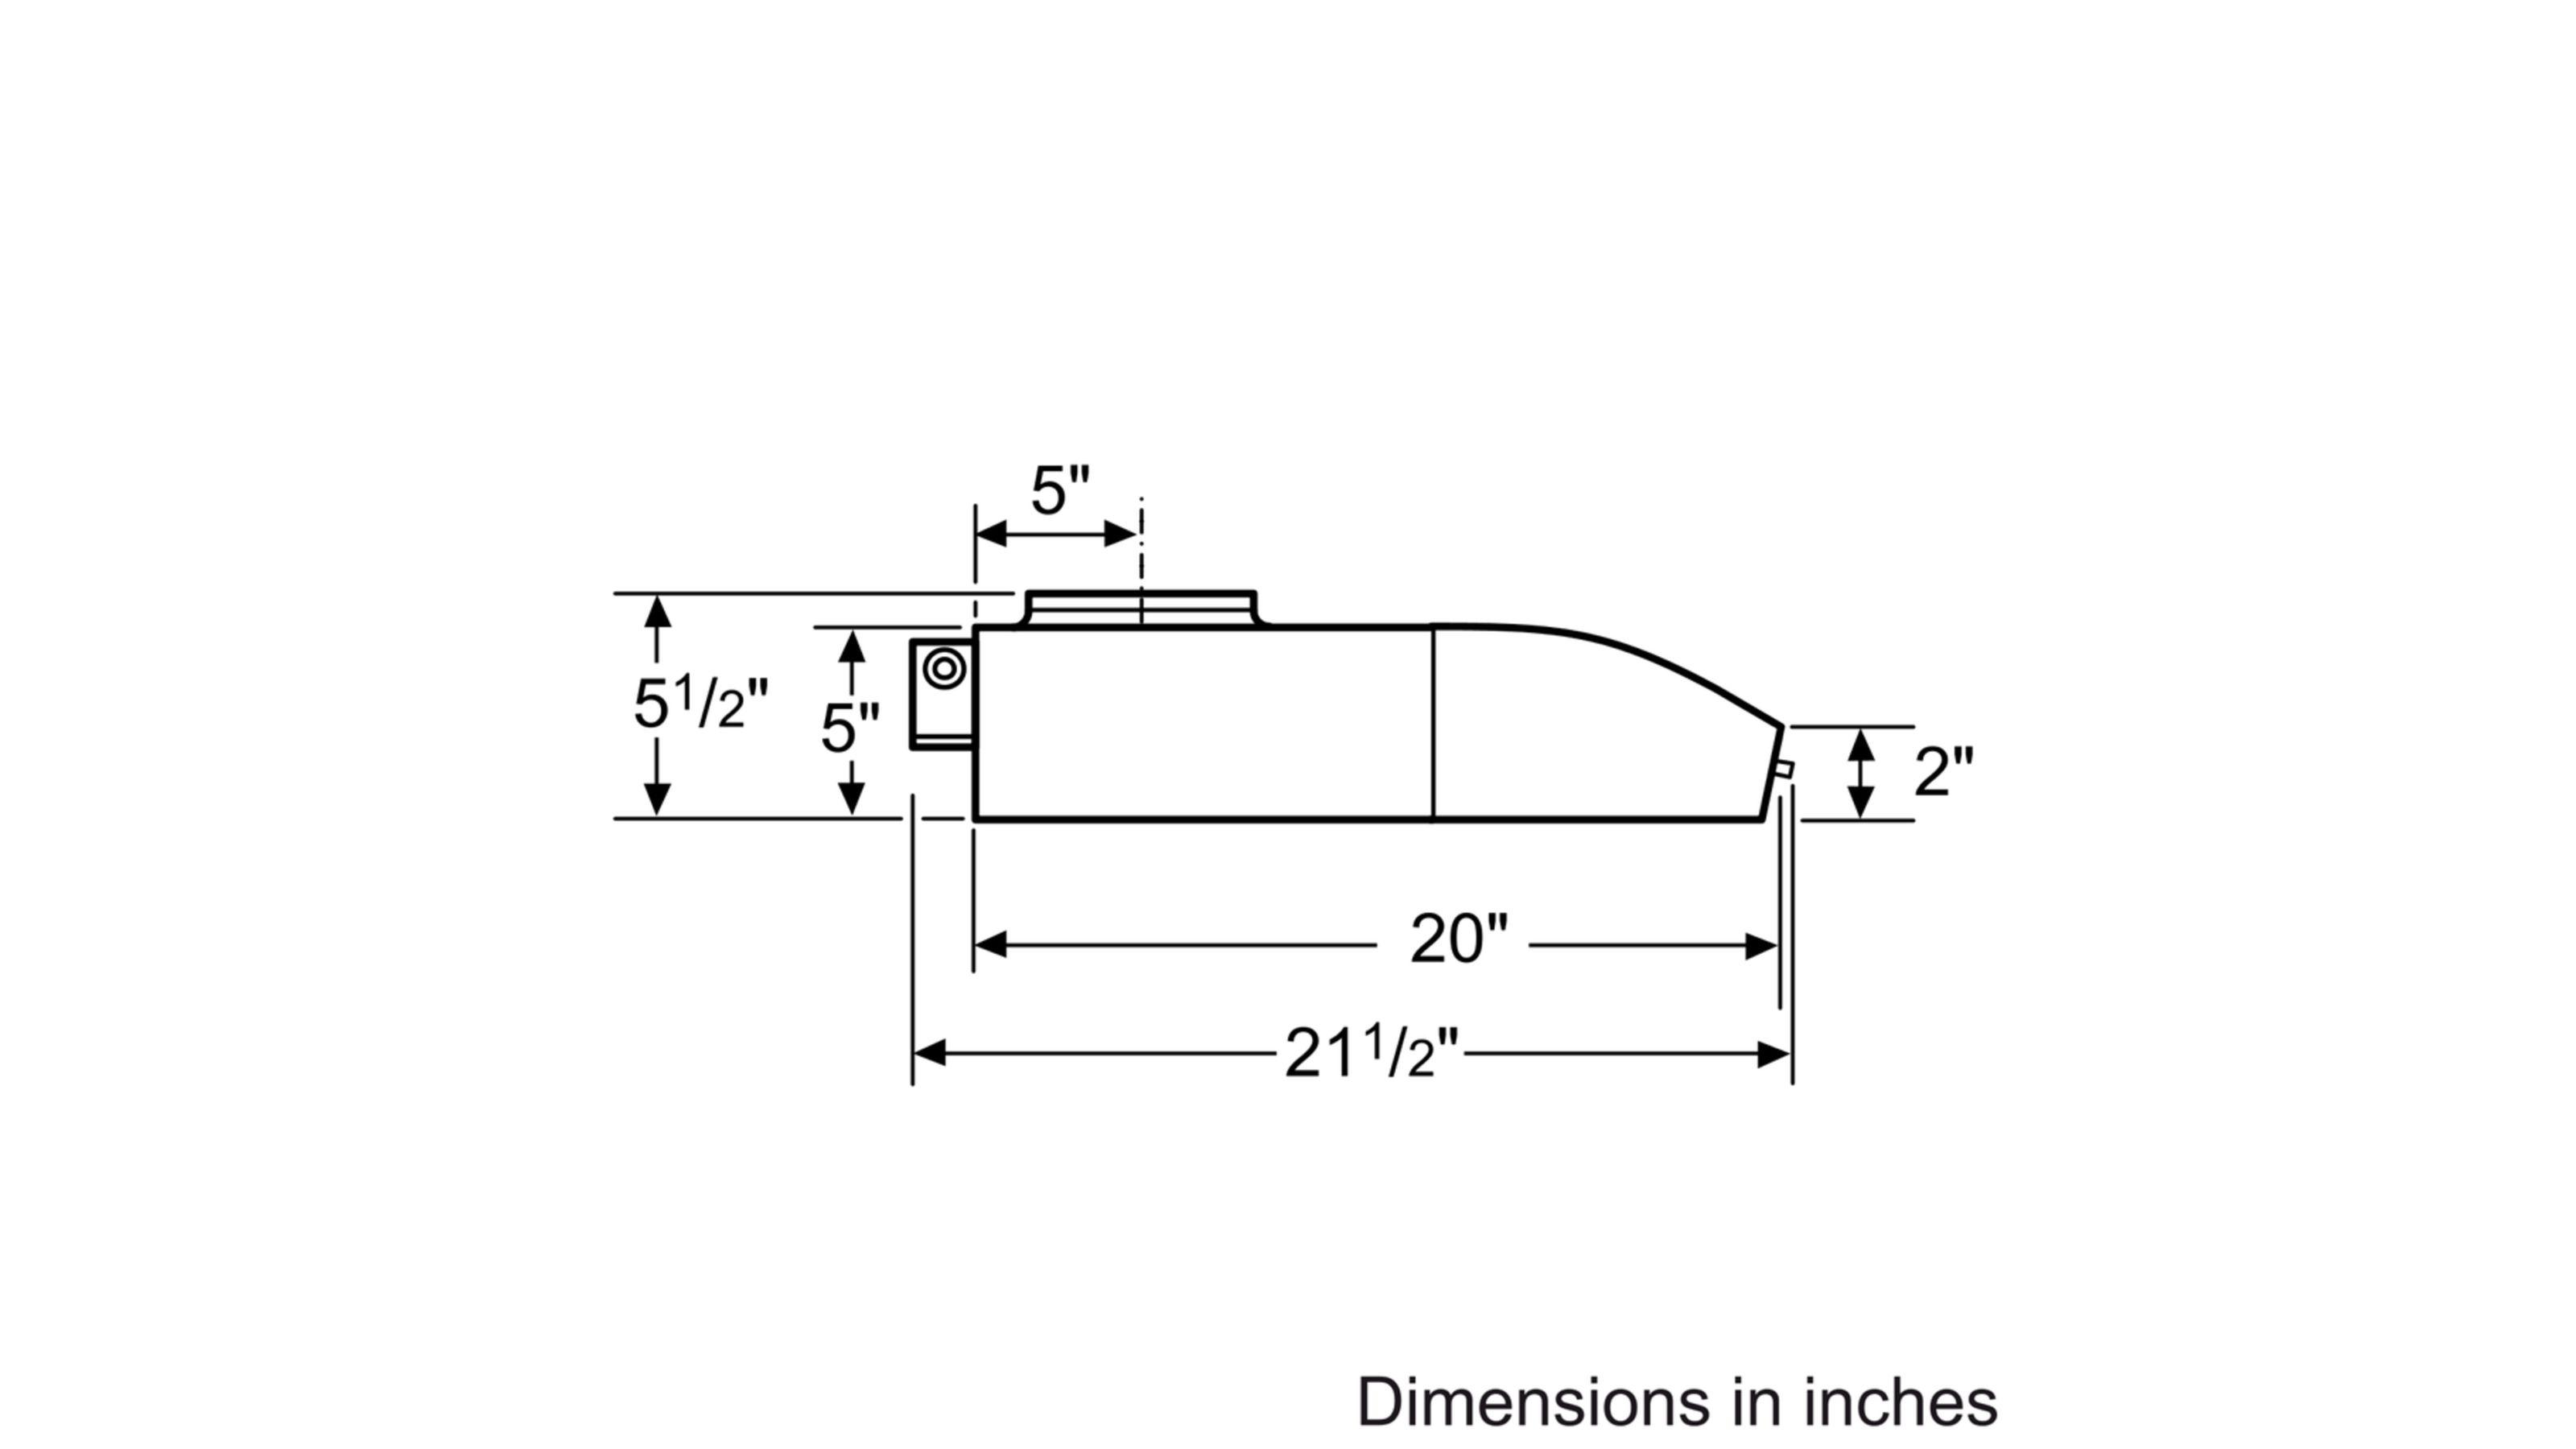 "Model: DUH30252UC | Bosch 500 Series30"" Under-cabinet Hood, 400 CFM, DUH30252UC, Stainless Steel"